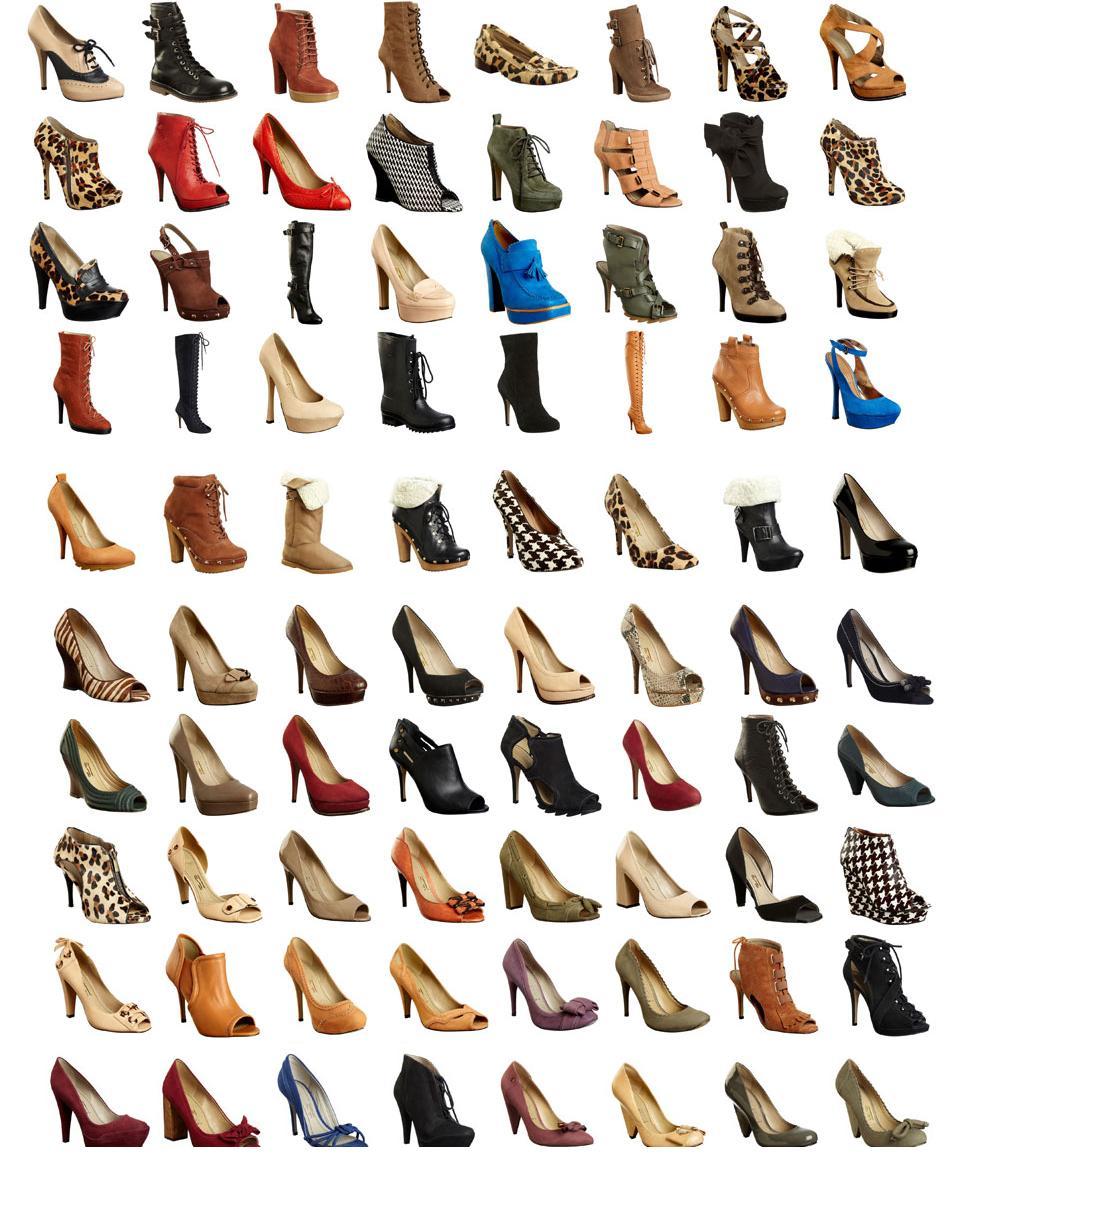 sapato femininas-45